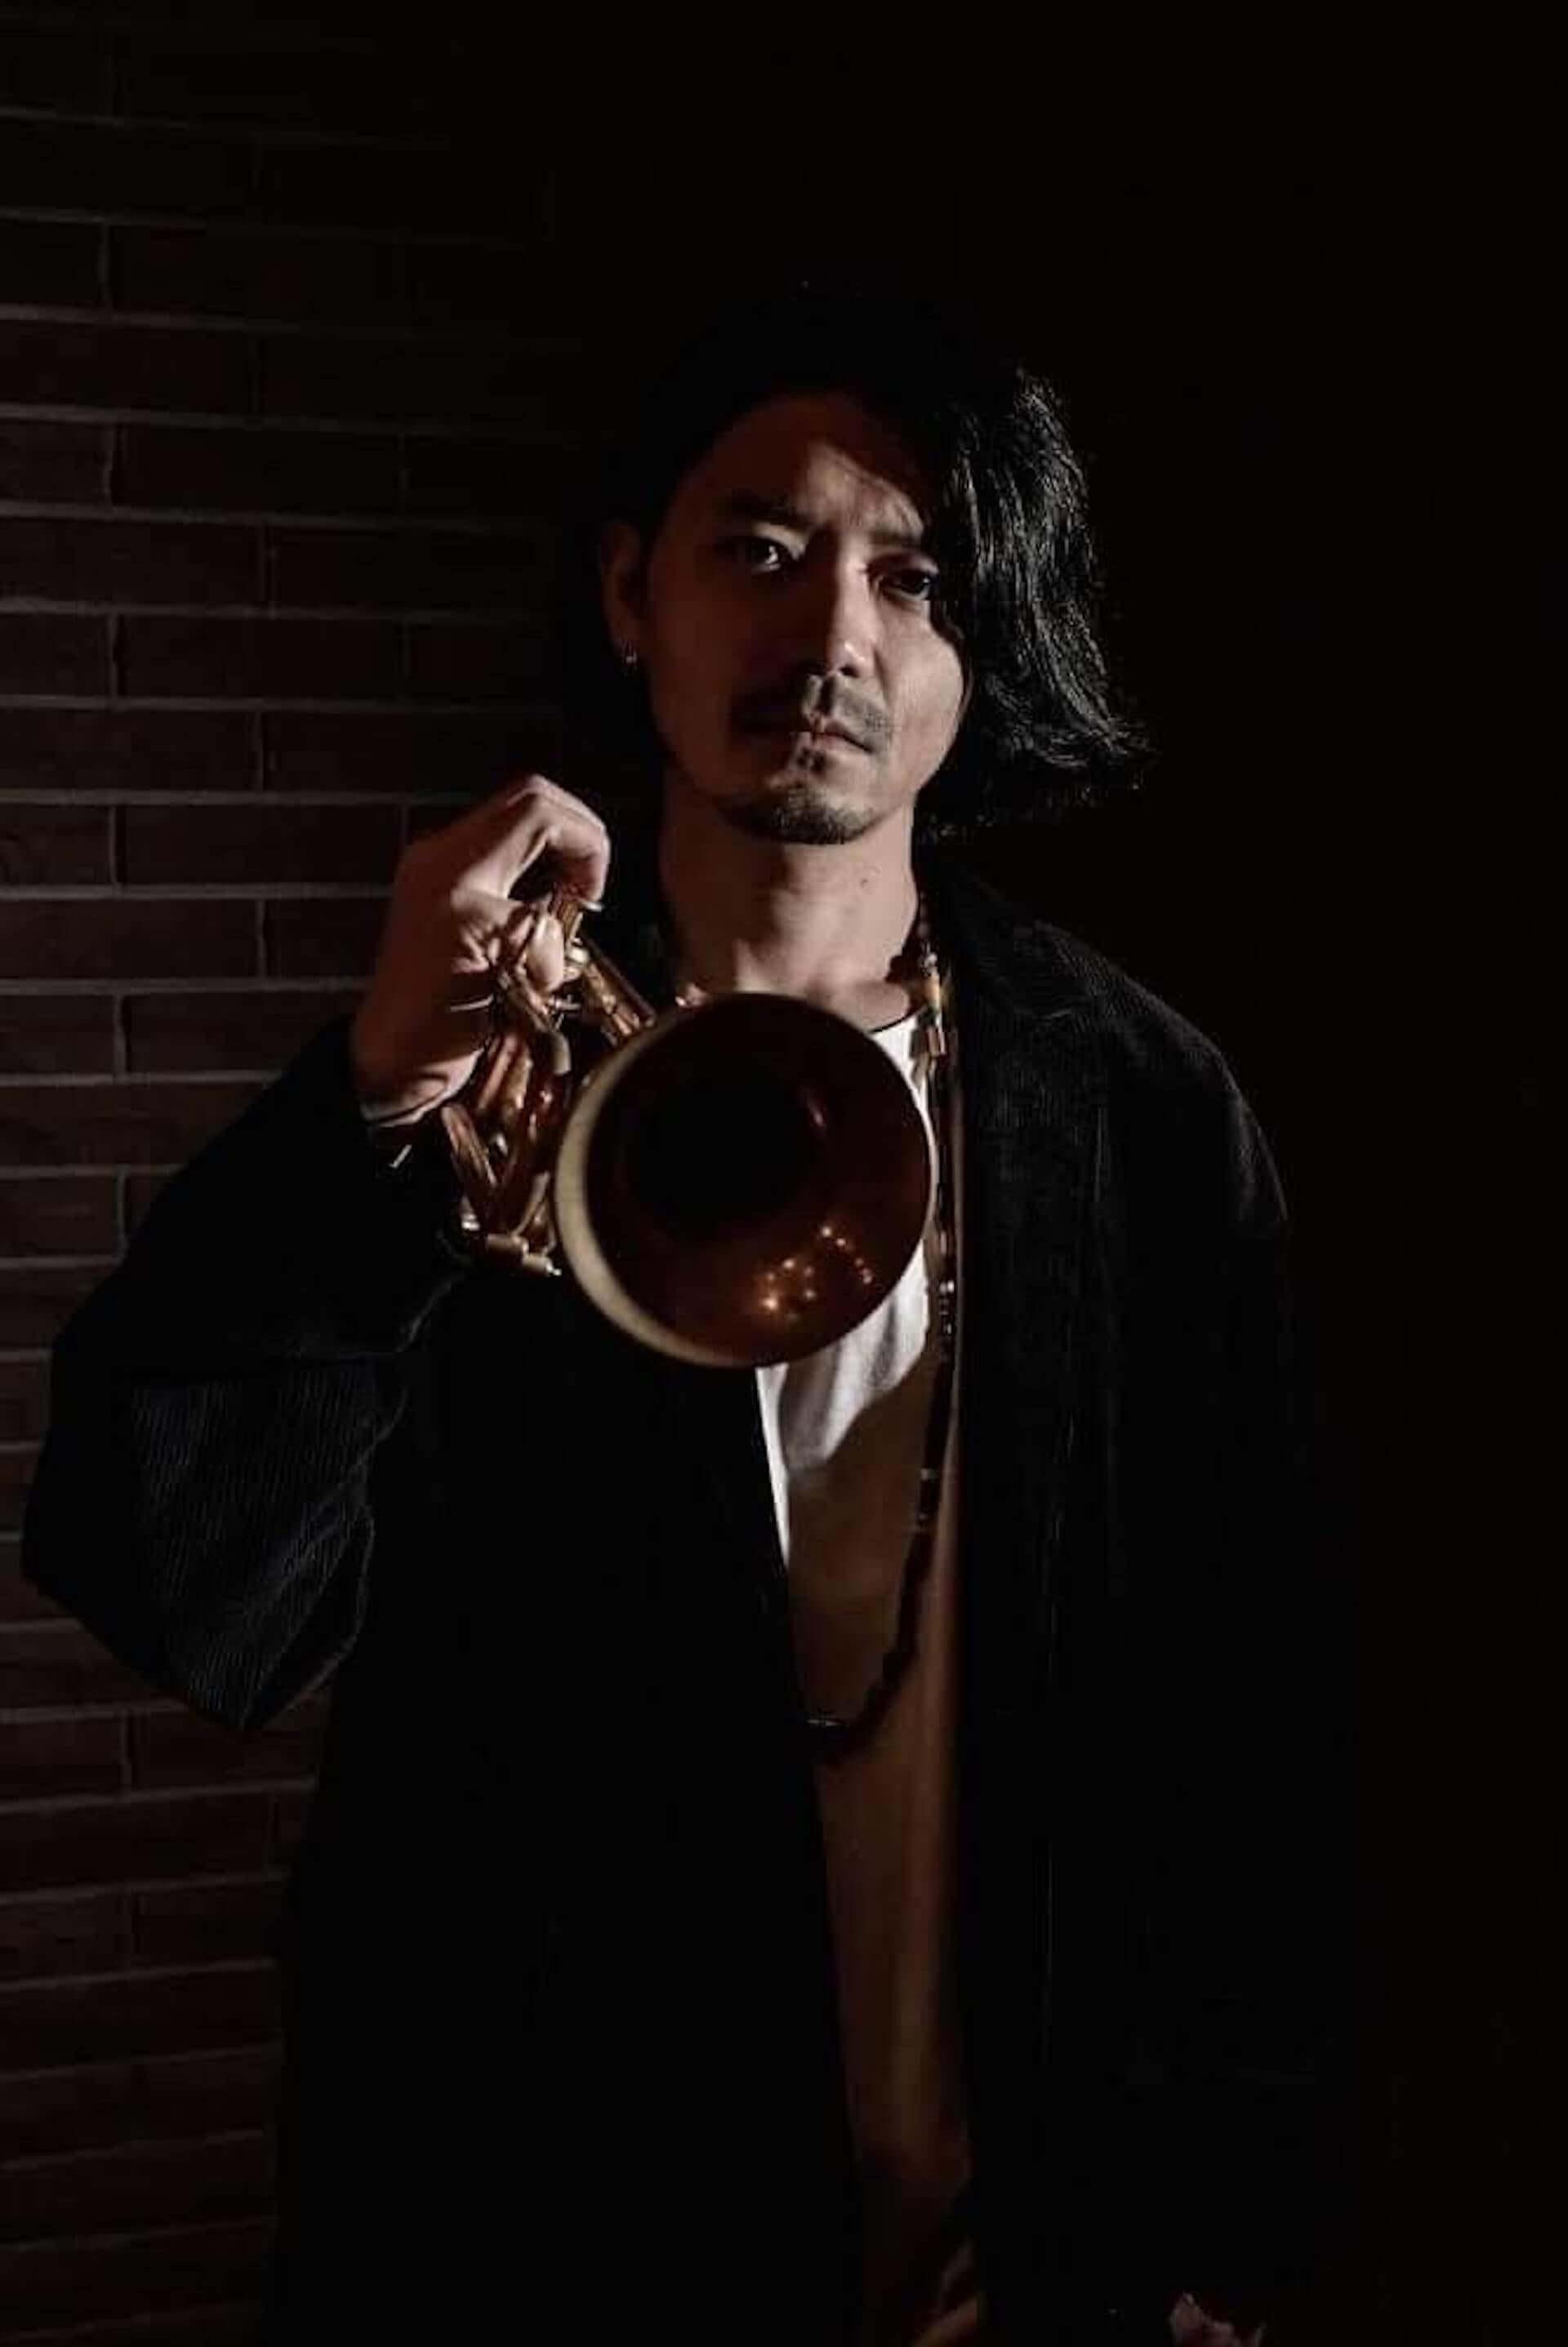 Yasei Collectiveのリーダー、松下マサナオが新たな動画企画「HIDEOUT SESSIONS」を始動!初回ゲストは類家心平 music200807_masanao-matsushita_3-1920x2874